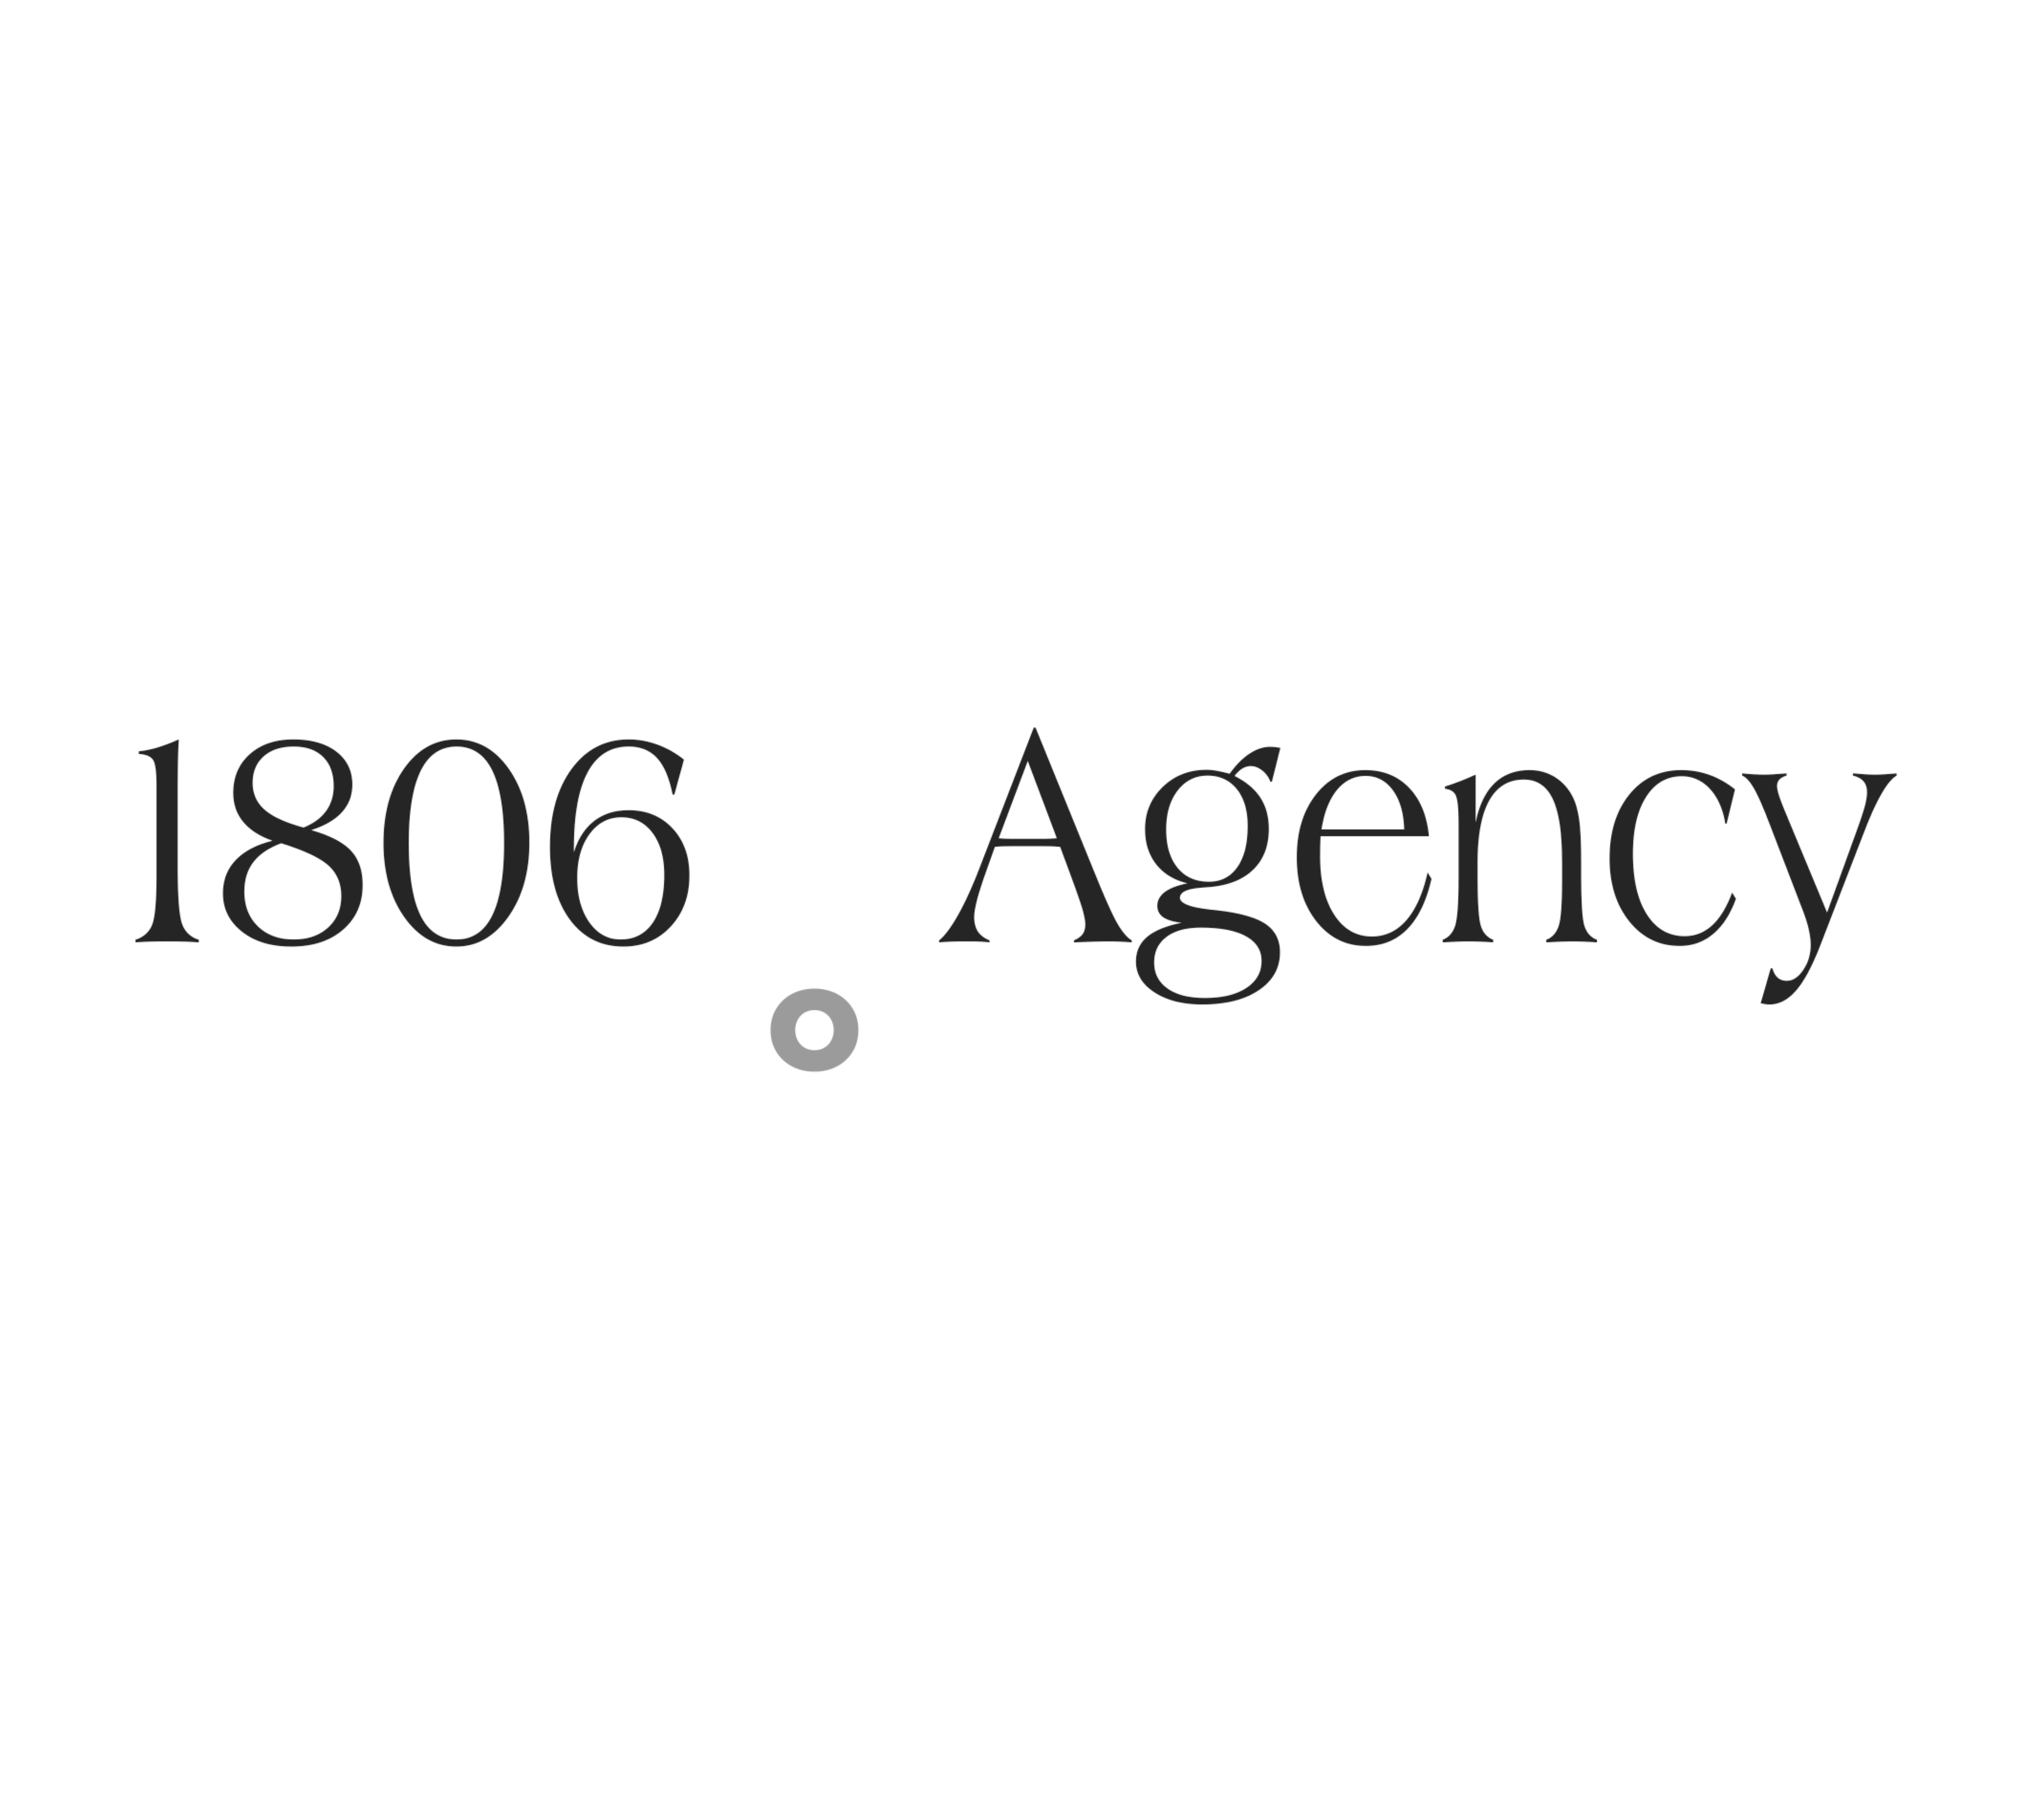 1806 Agency